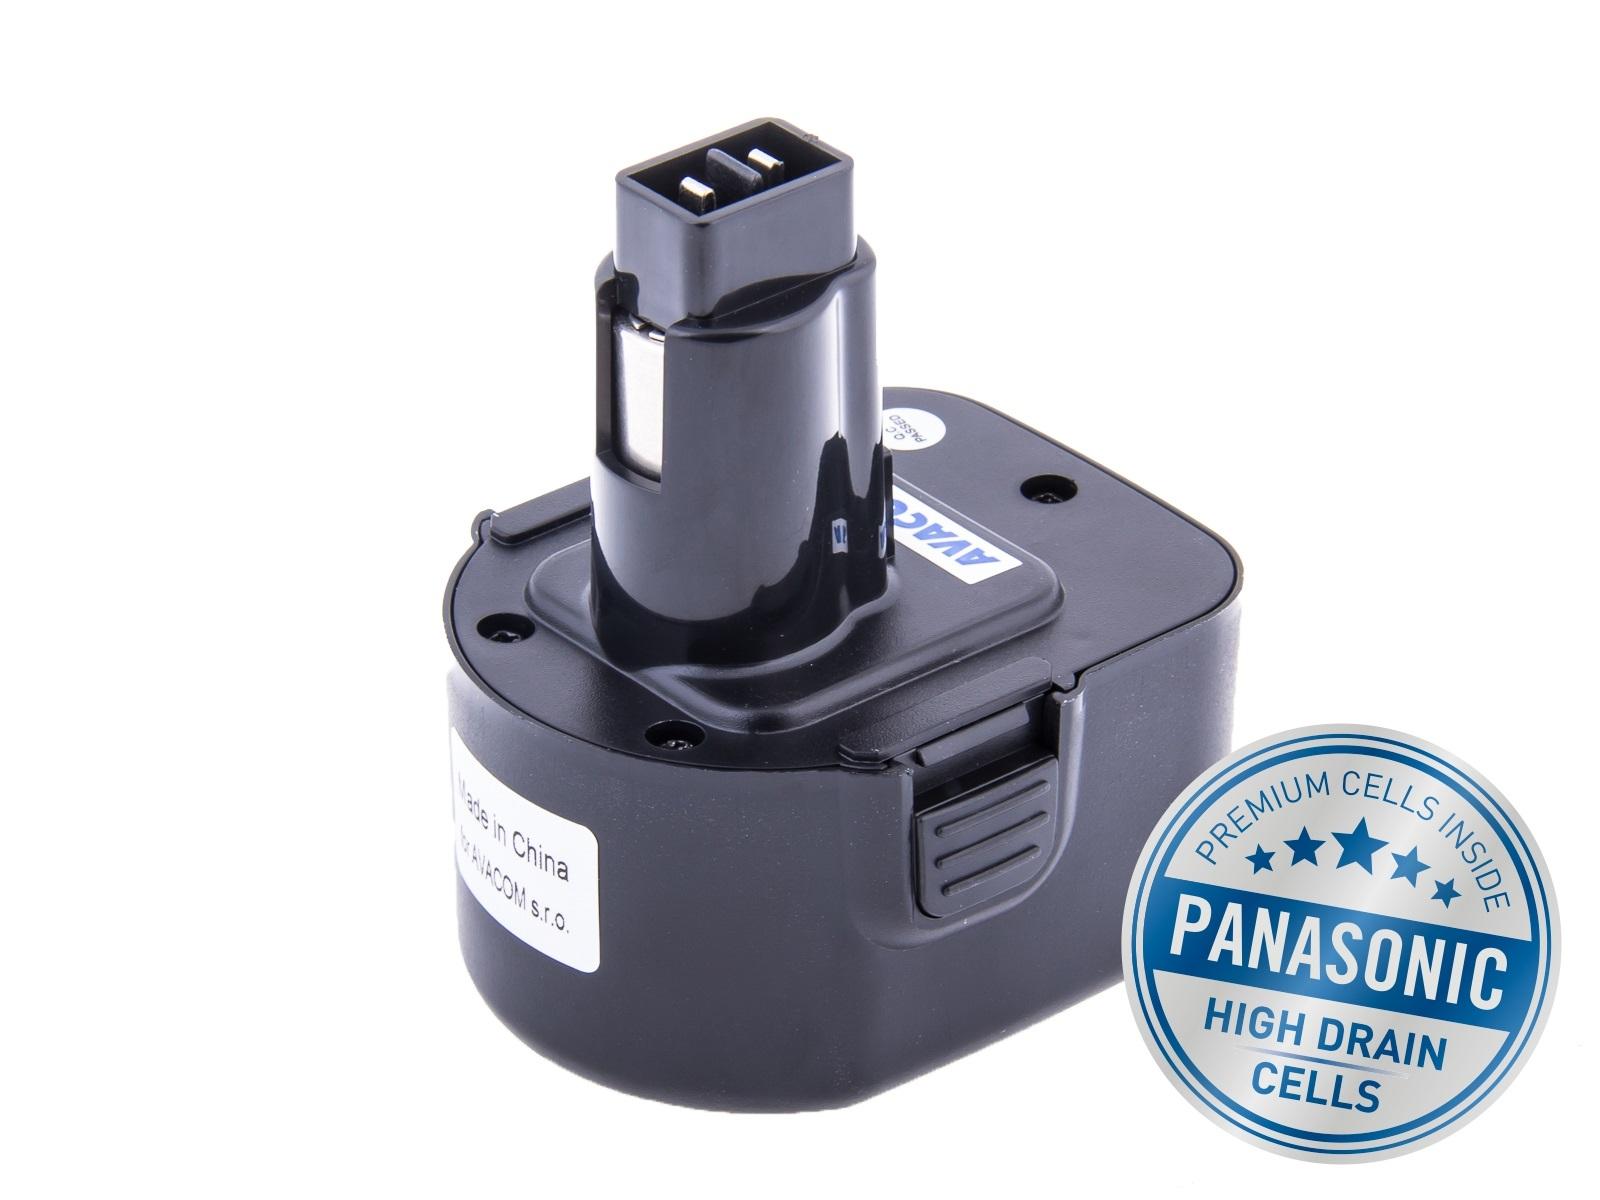 Baterie AVACOM BLACK & DECKER A9252  Ni-Mh 12V 3000mAh, články PANASONIC - ATBD-12Mh-30H